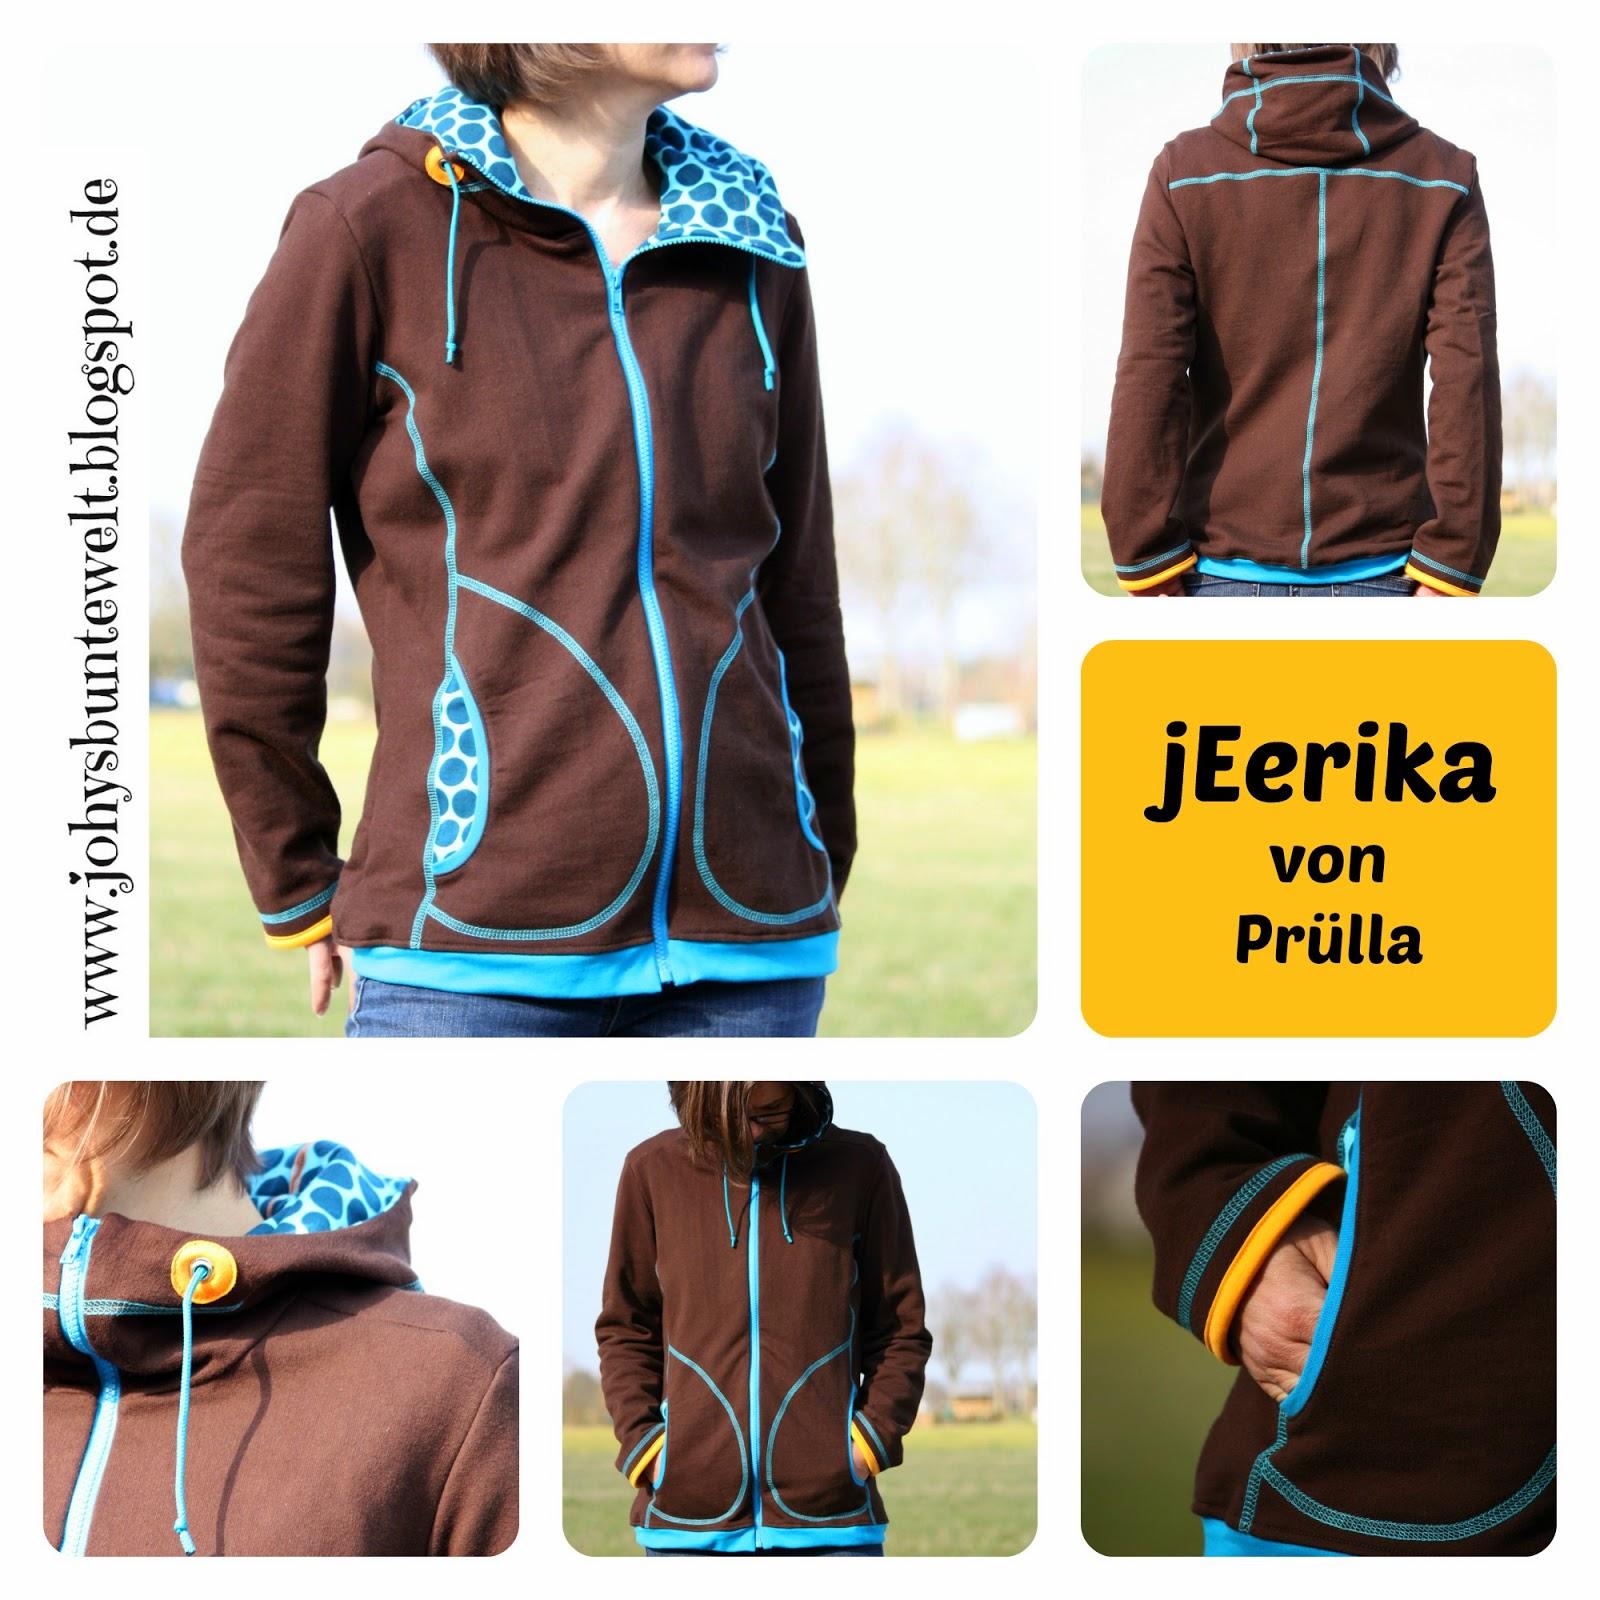 http://johysbuntewelt.blogspot.de/2015/04/rums-25-jerika-meine-neue-jacke.html